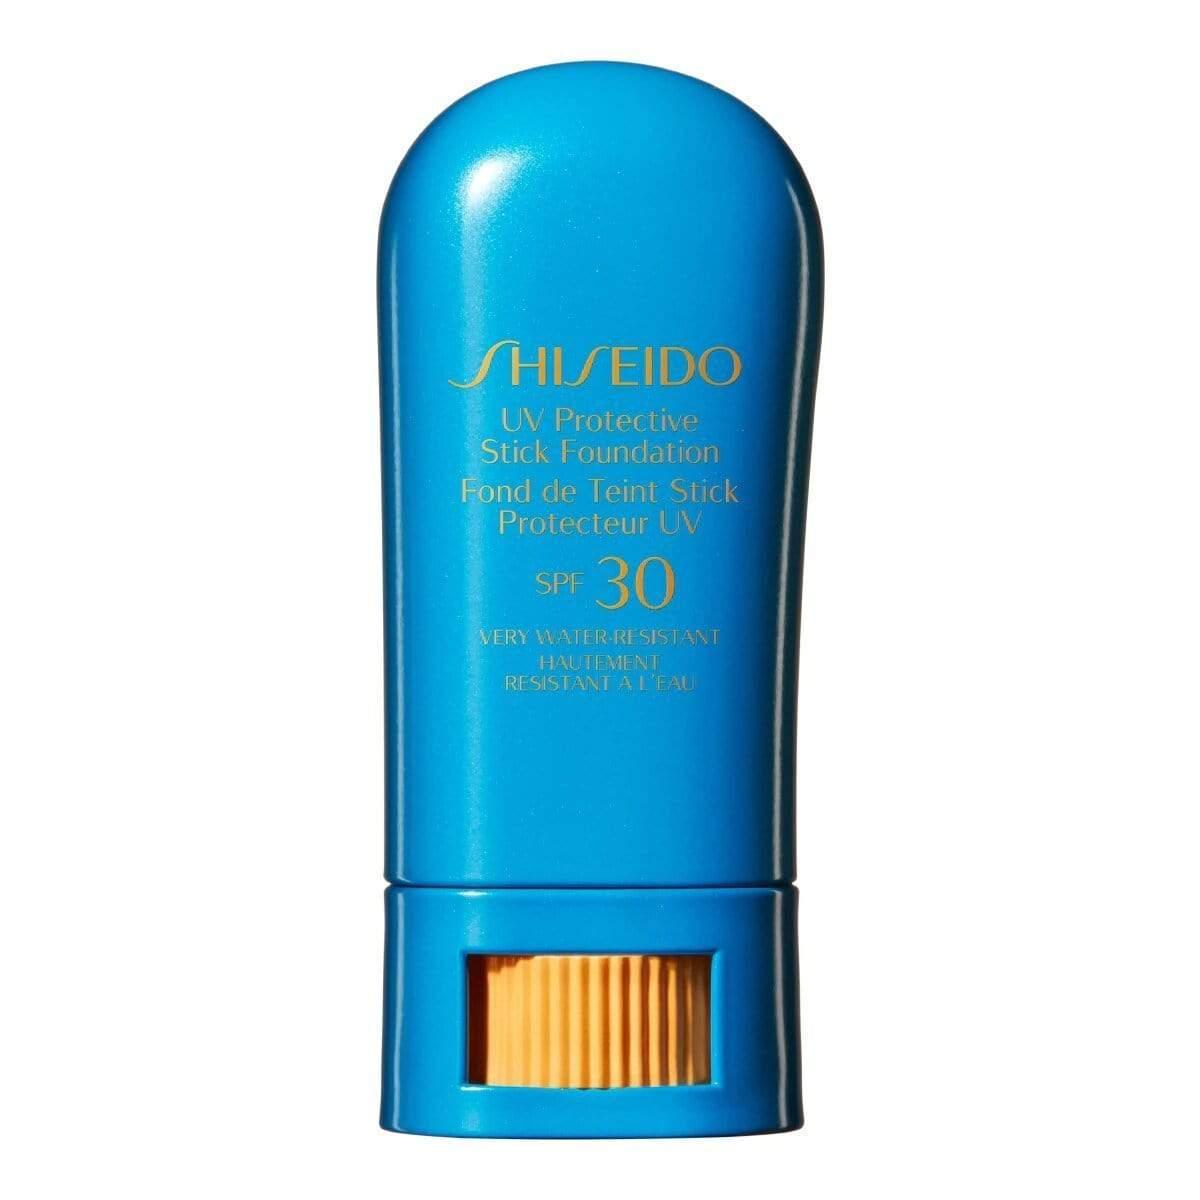 Fond-de-Teint-Stick-Protecteur-UV-SPF-30-100801147-1